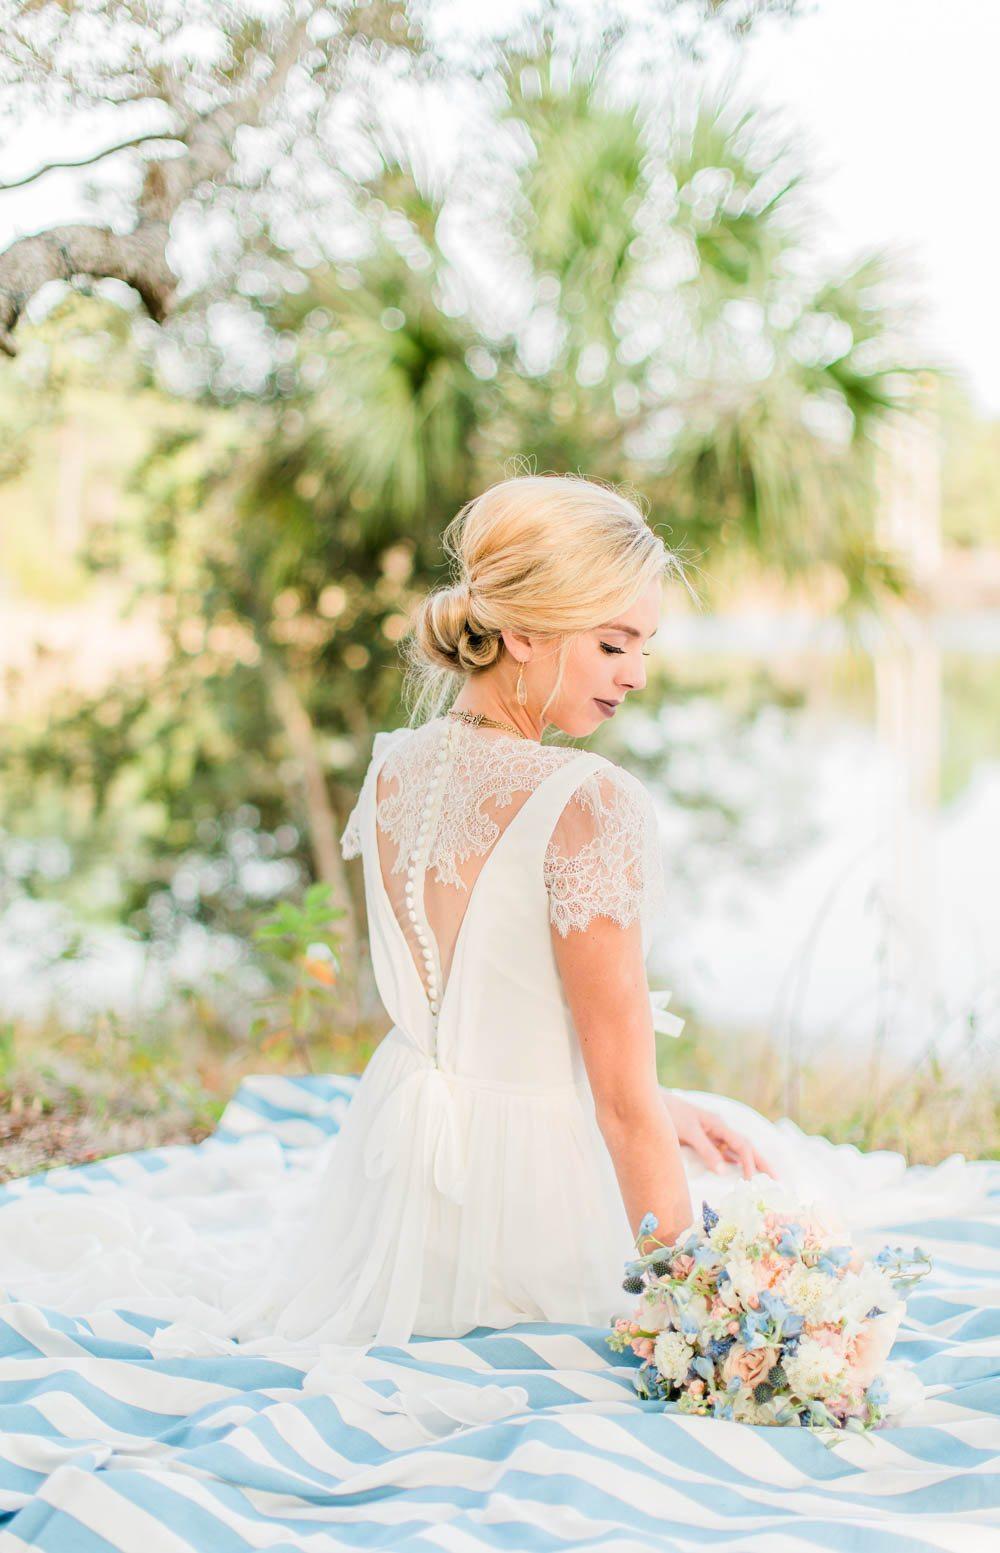 lace wedding dress bridal hair updo